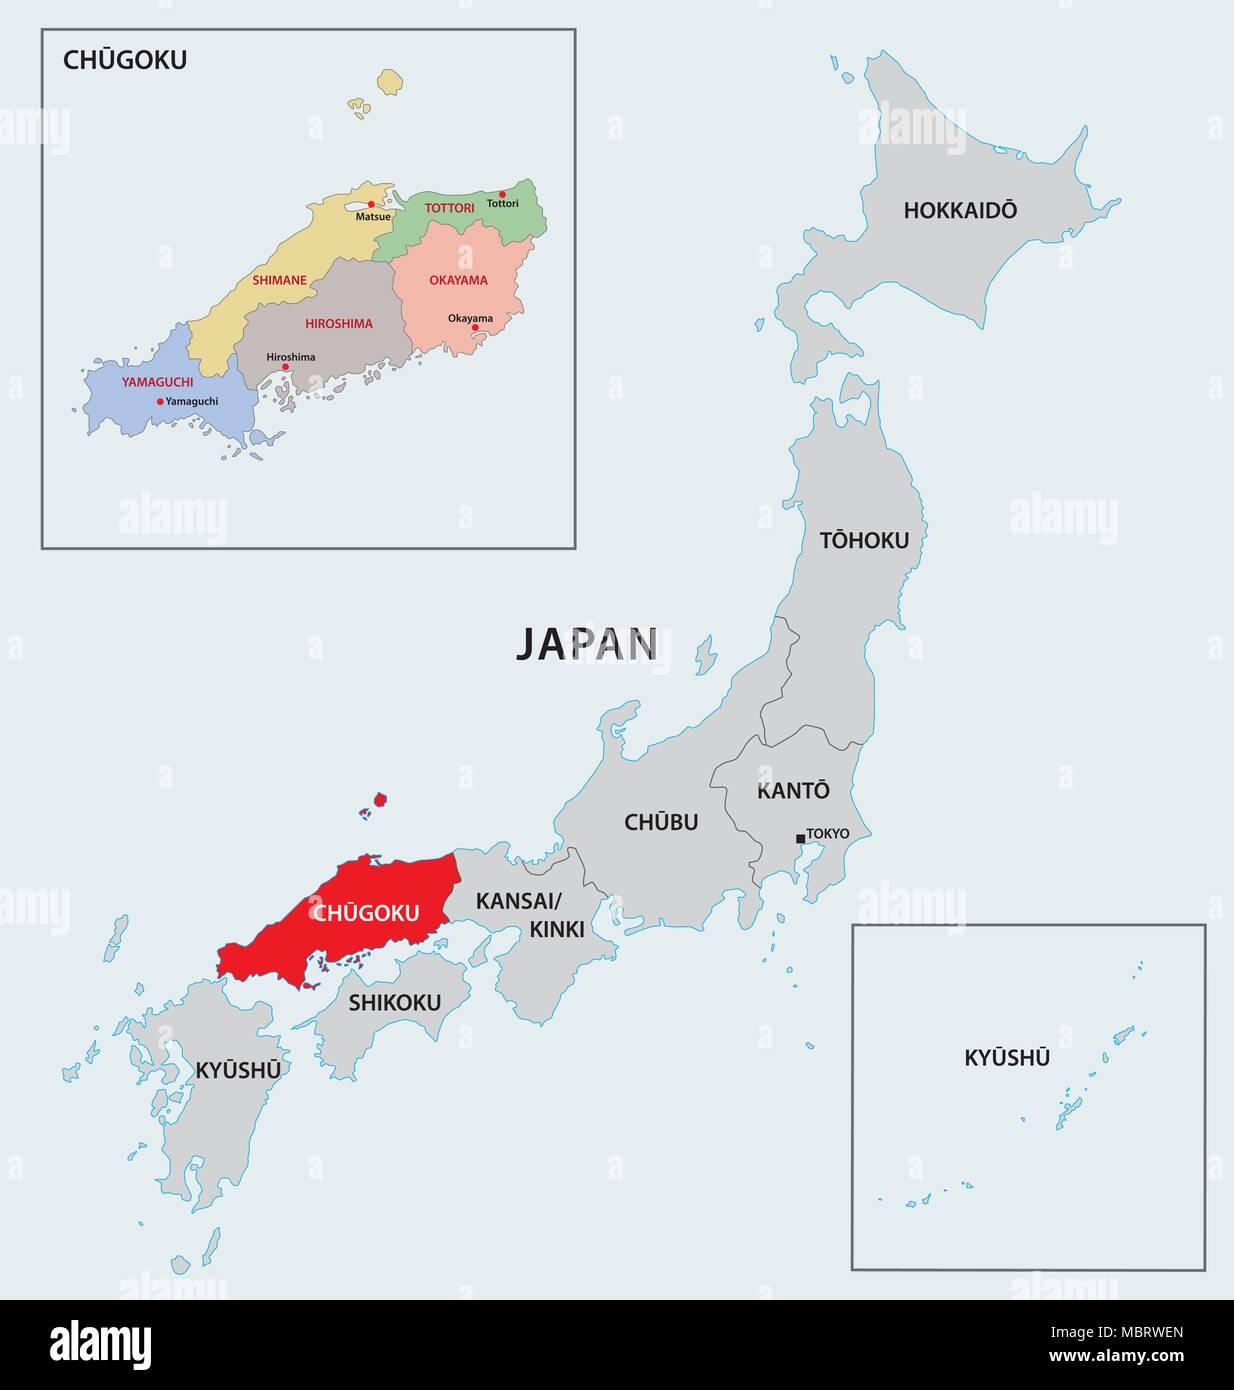 japan region chugoku map Stock Vector